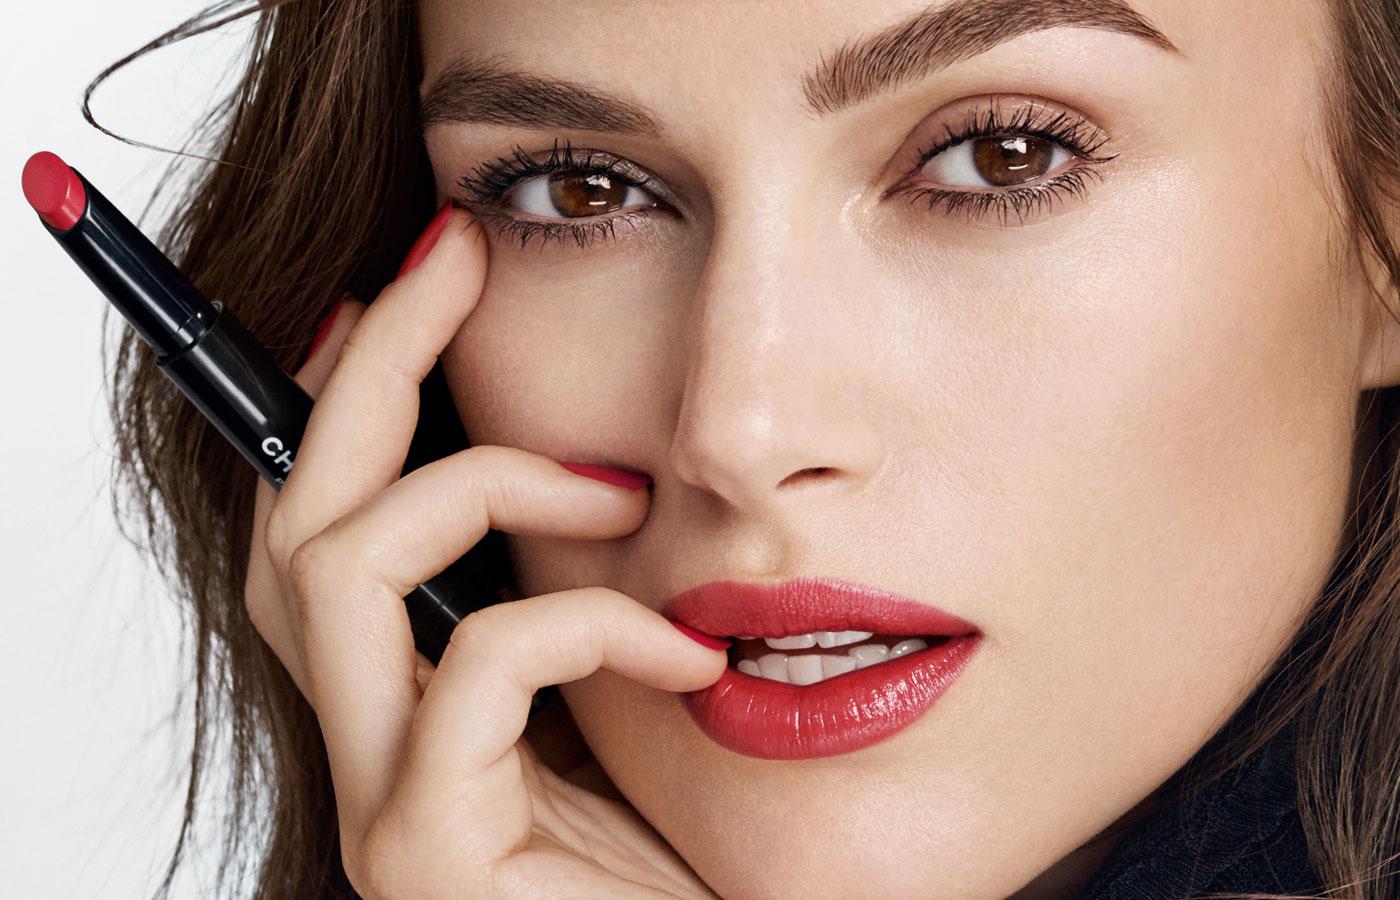 Dapatkan Bibir Merah Aktris Keira Knightley Dengan Lipstik Chanel Terbaru Rouge Coco Stylo